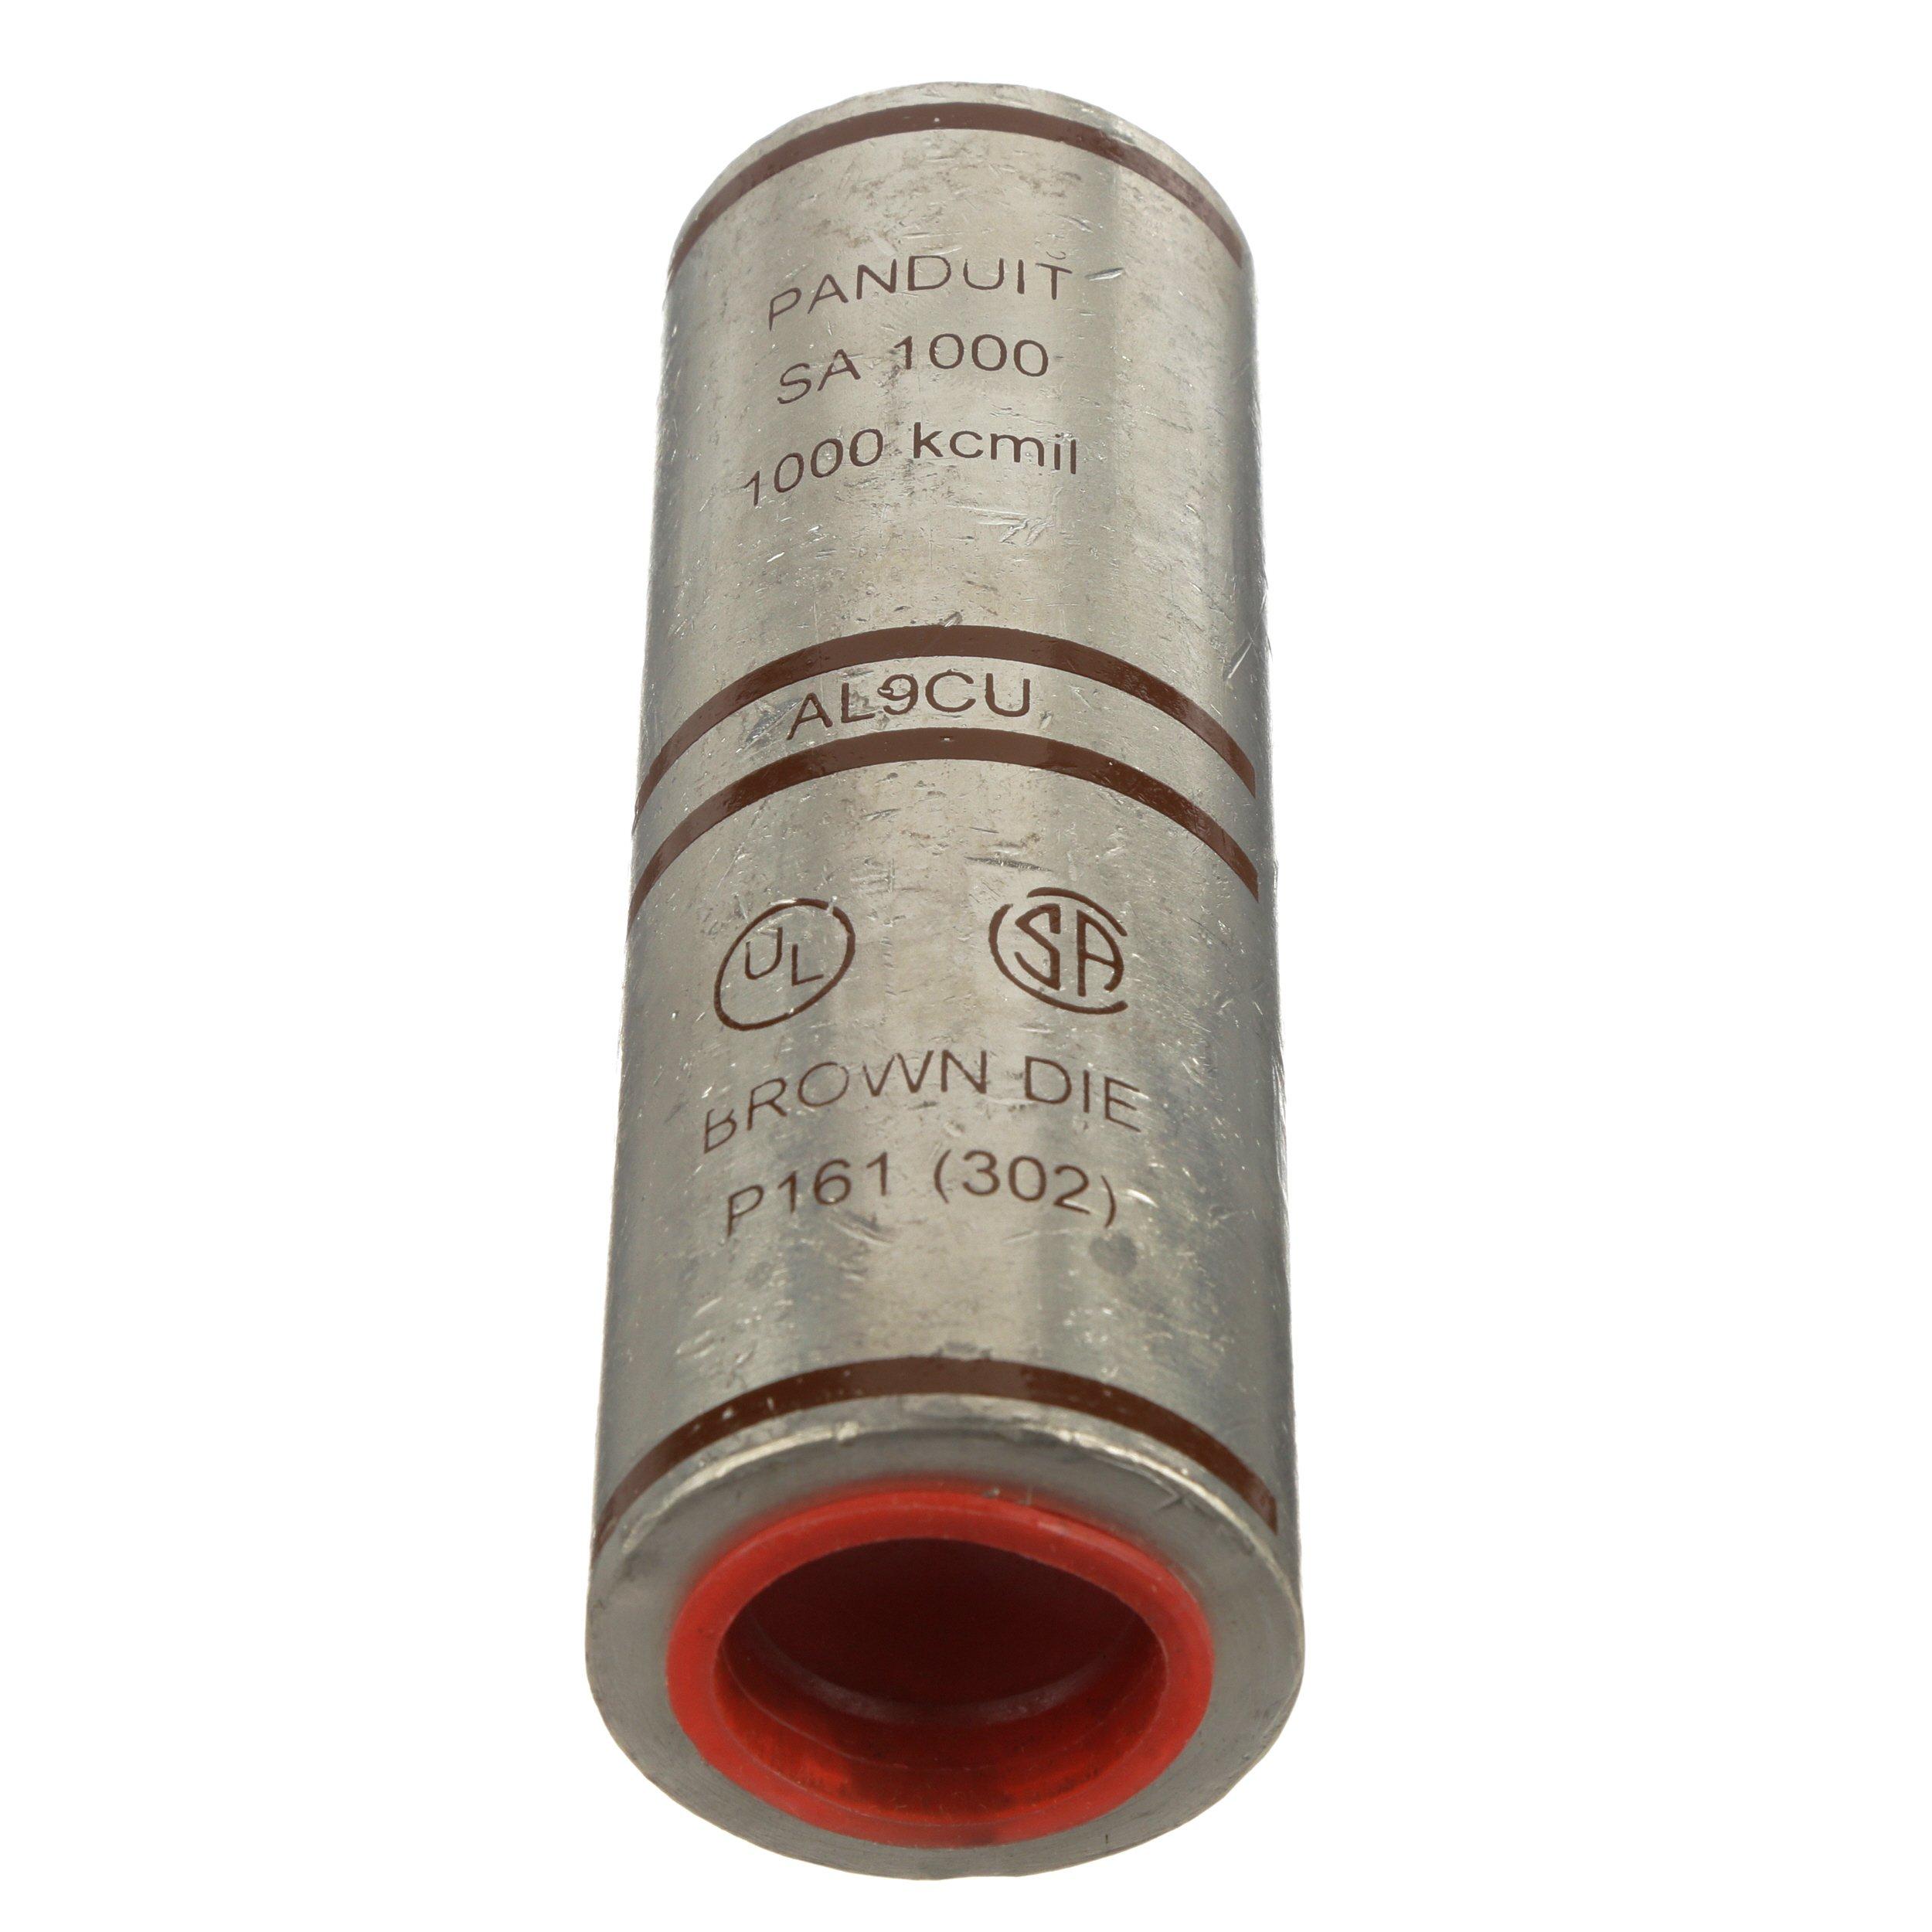 Panduit SA1000-1 Barrel Code Conductor Splice, Aluminum, 1000 kcmil Aluminum/Copper Conductor Size, Brown Color CBarrel ODe, 2-9/16'' Wire Strip Length, 1.84'' Barrel OD, 5.25'' Barrel Length